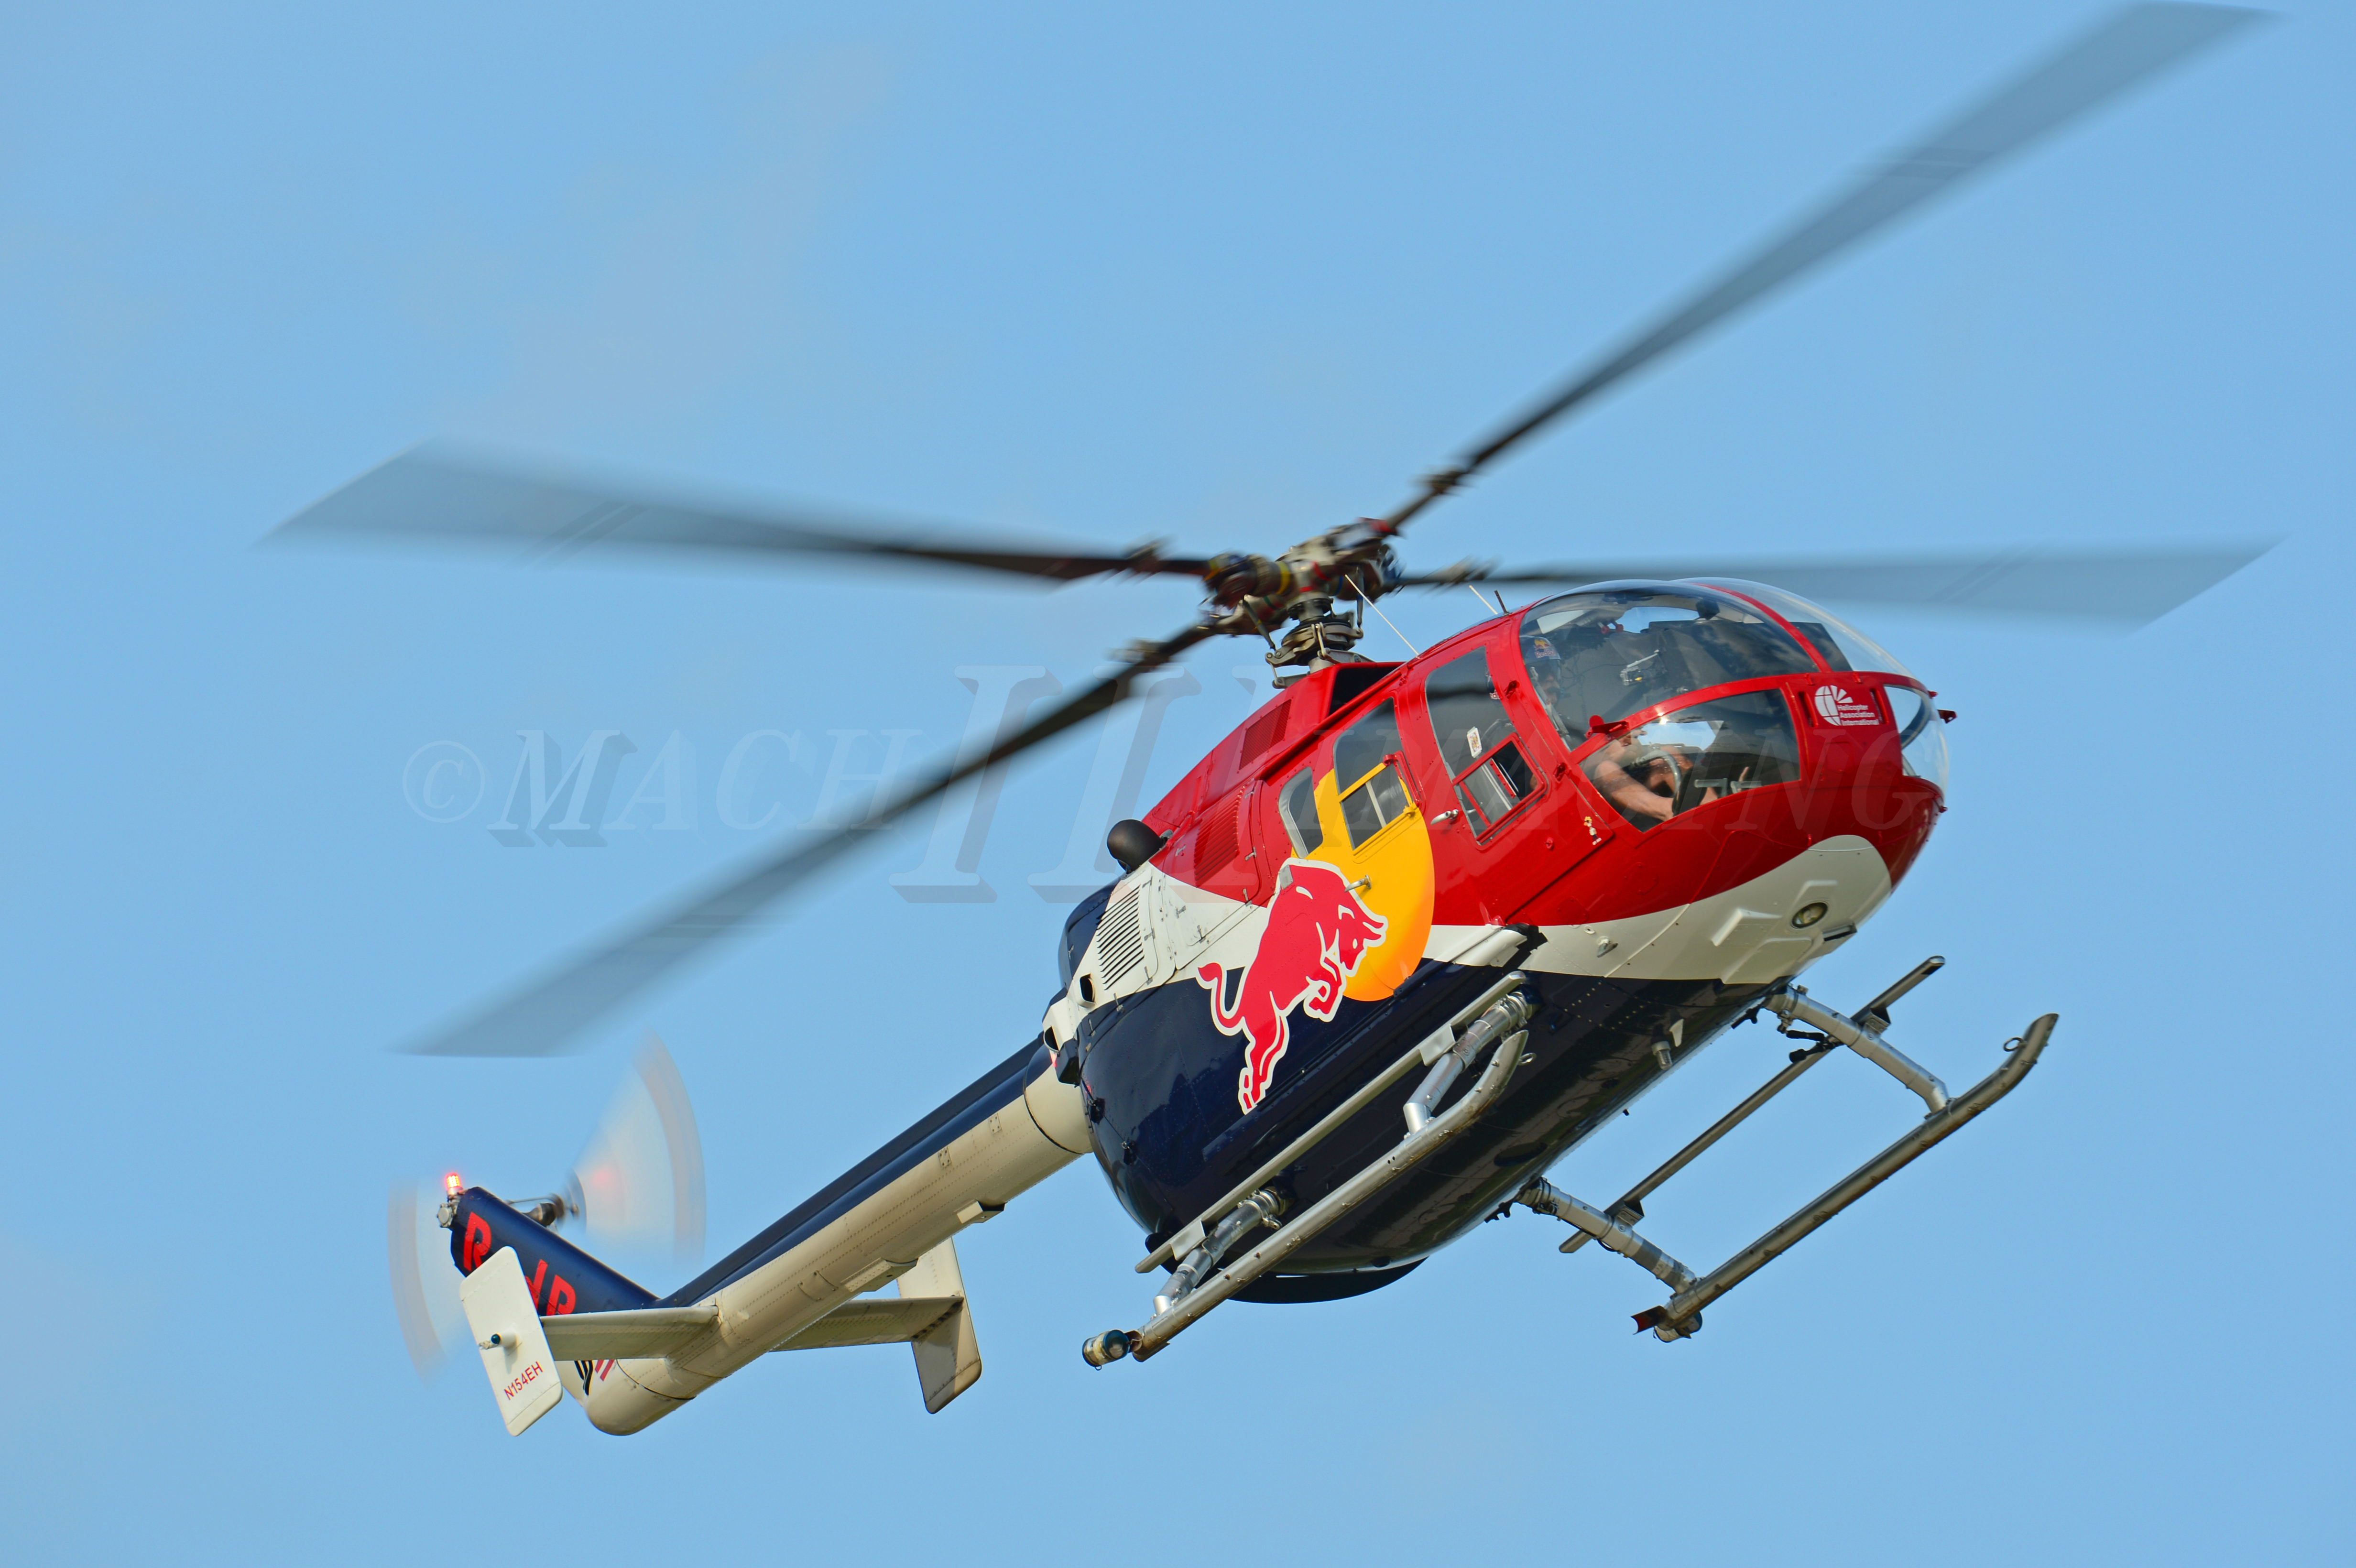 RedBull Helicopter Copyright